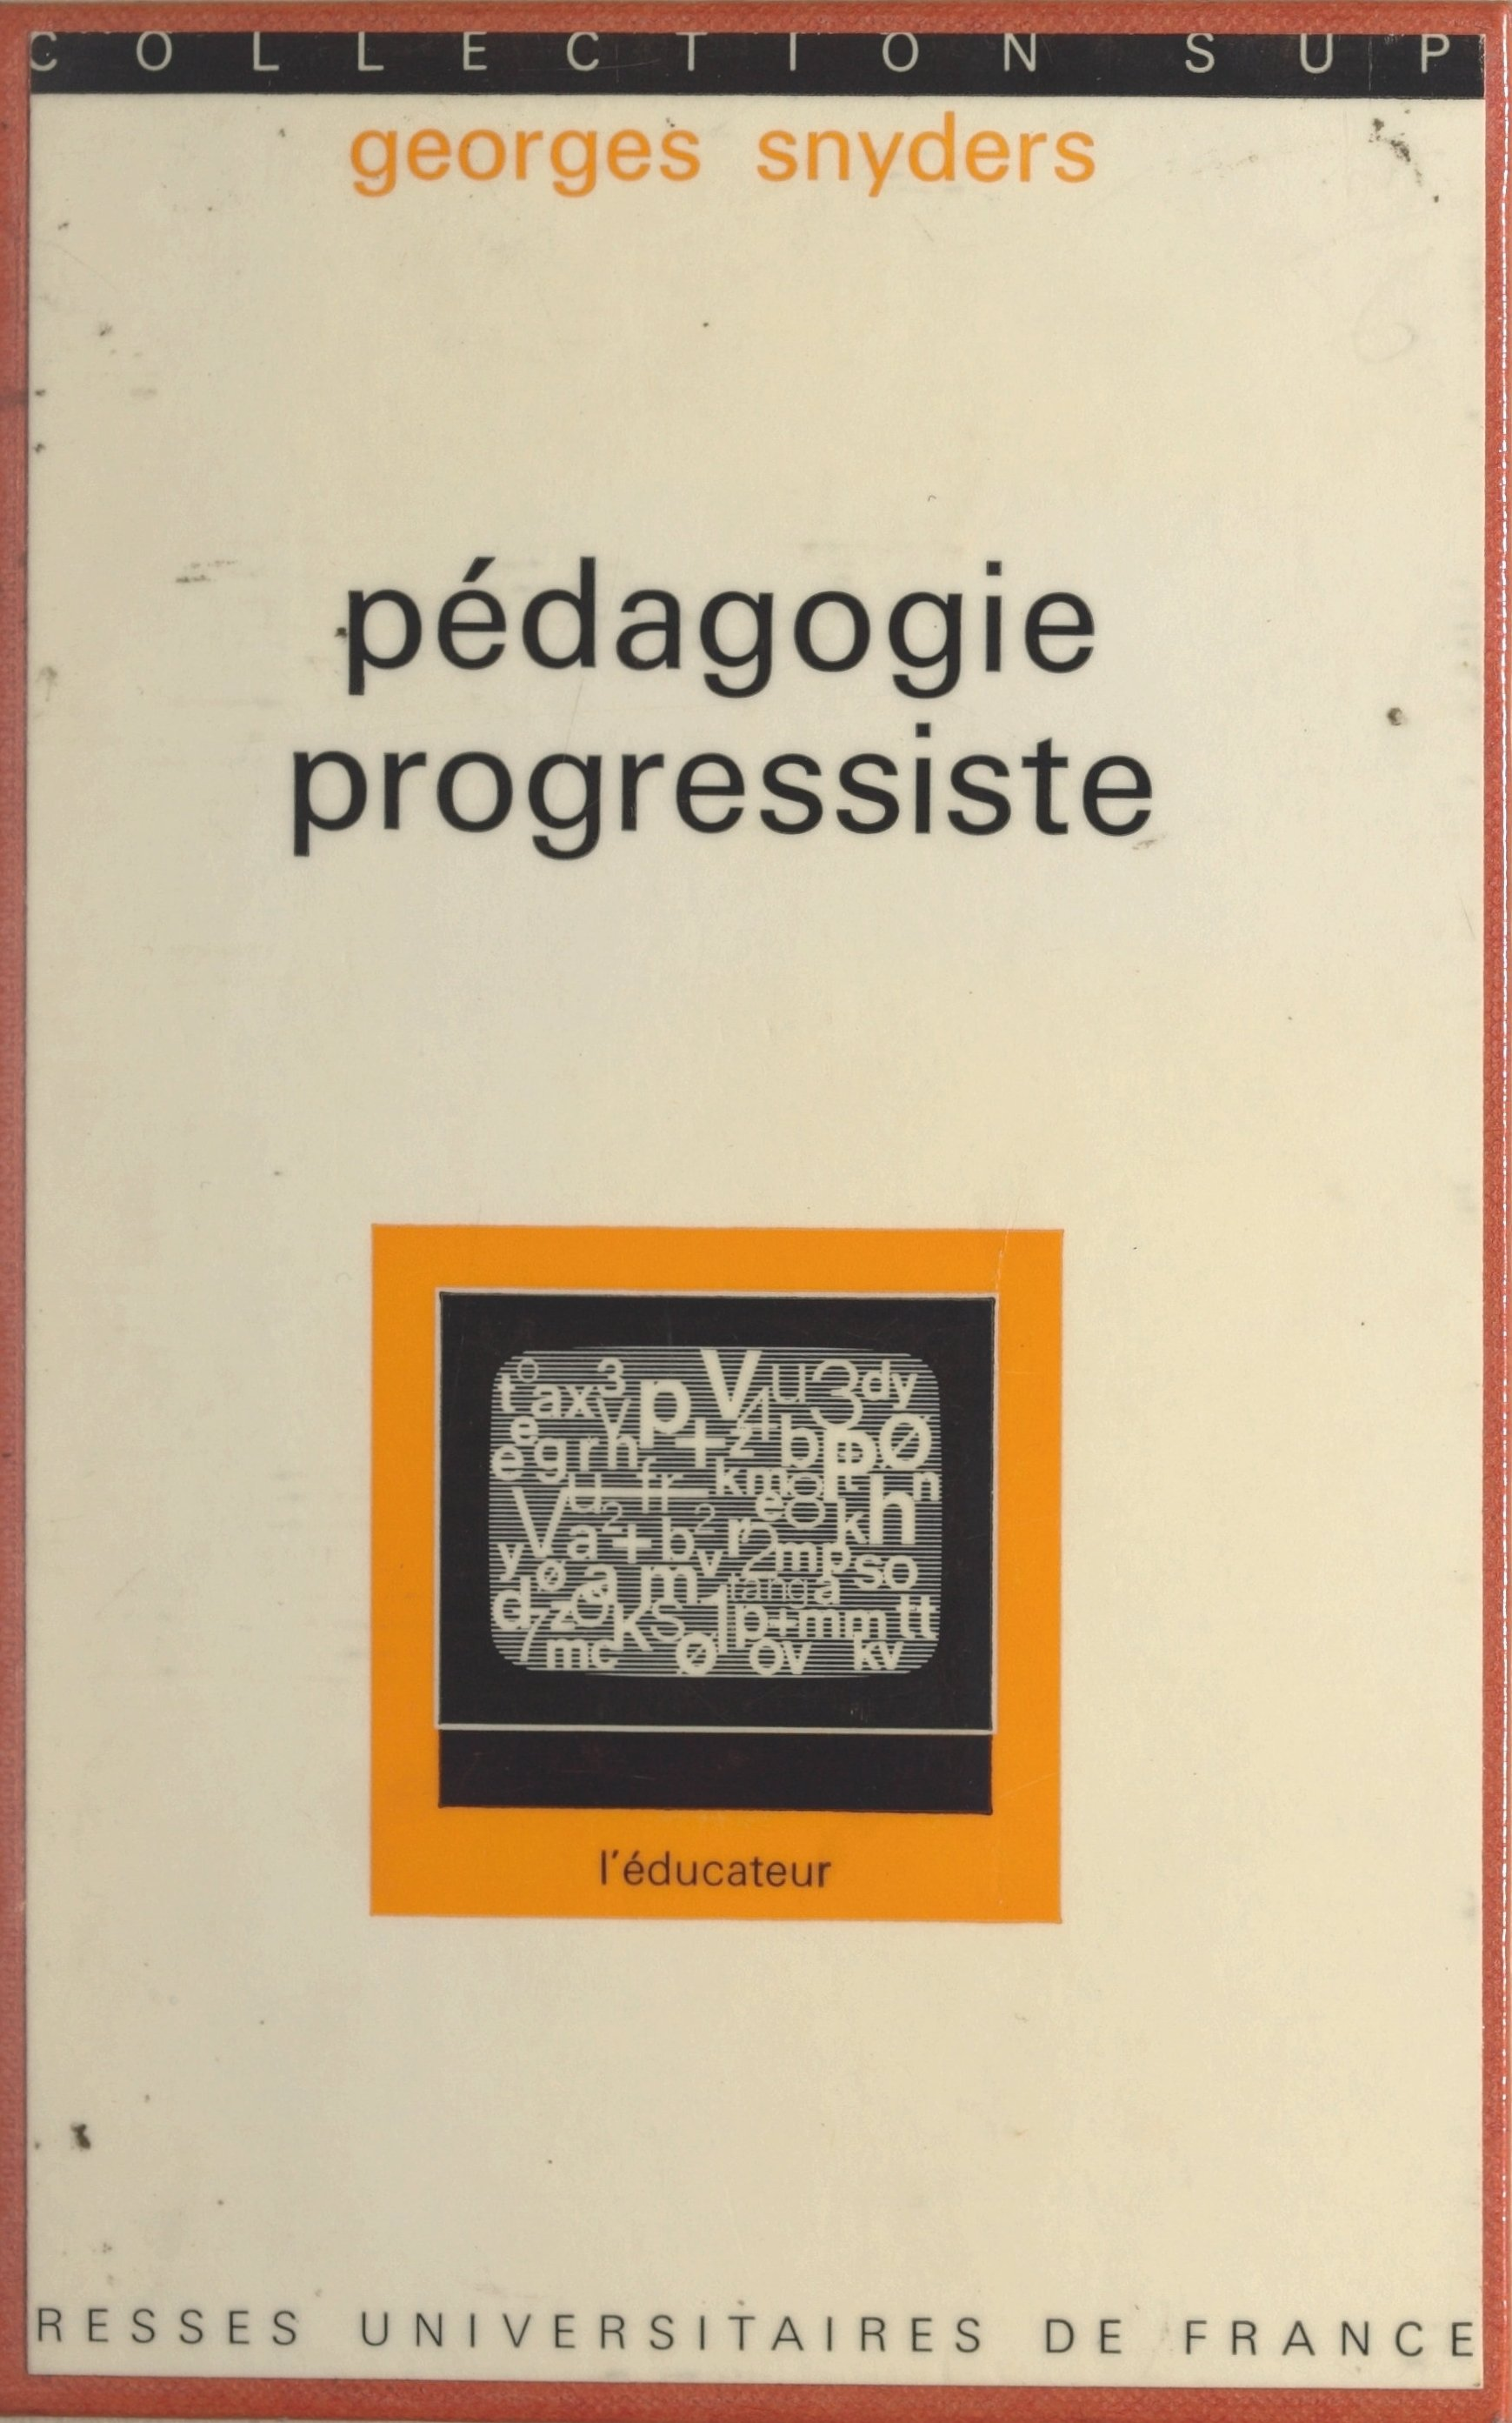 Pédagogie progressiste